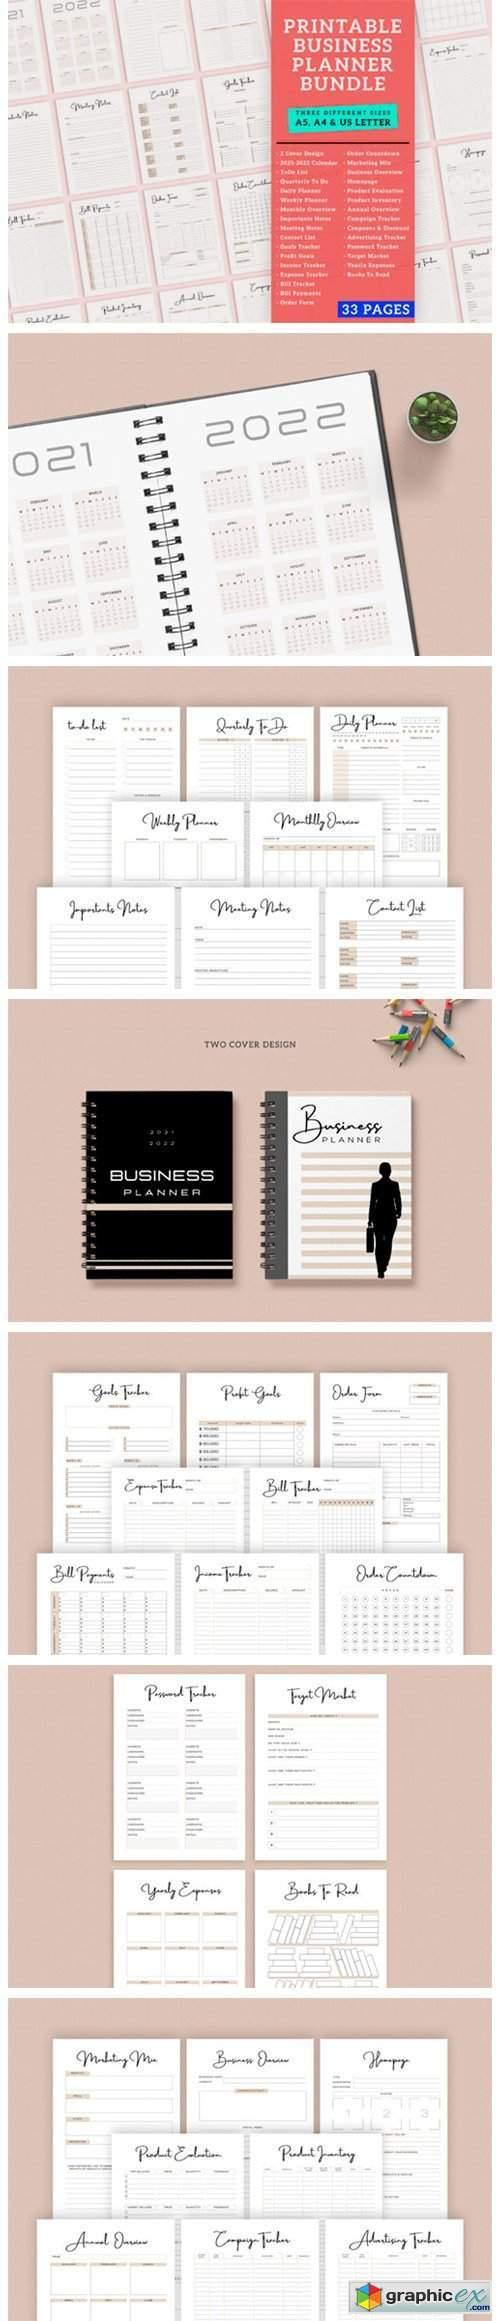 Business Finance Planner Printable